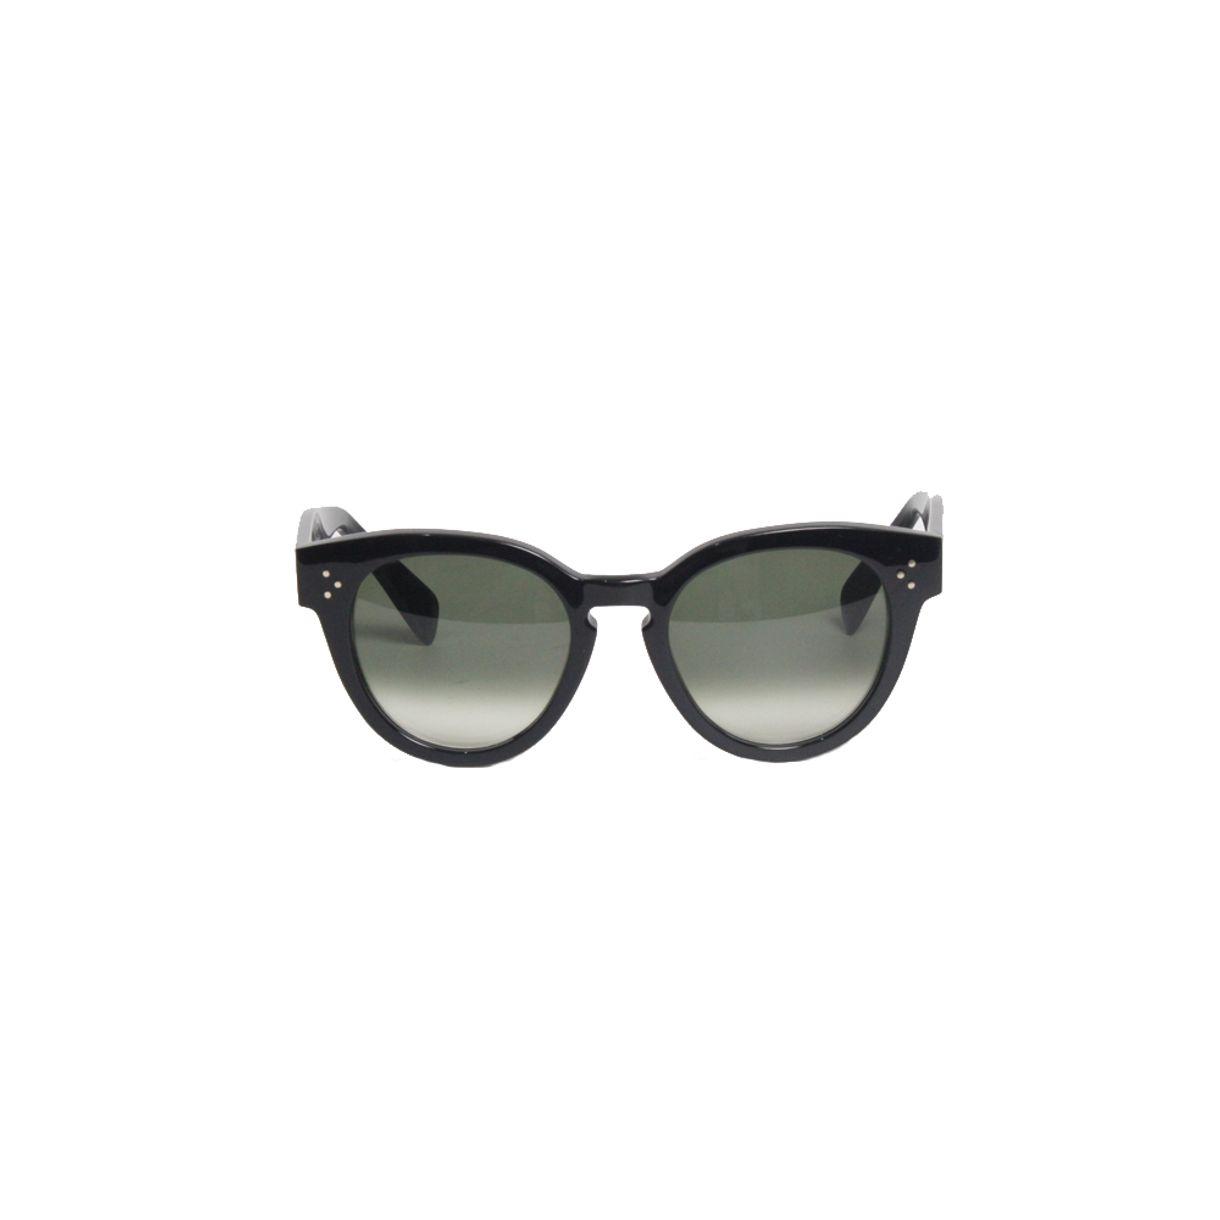 Oculos-Celine-Preto